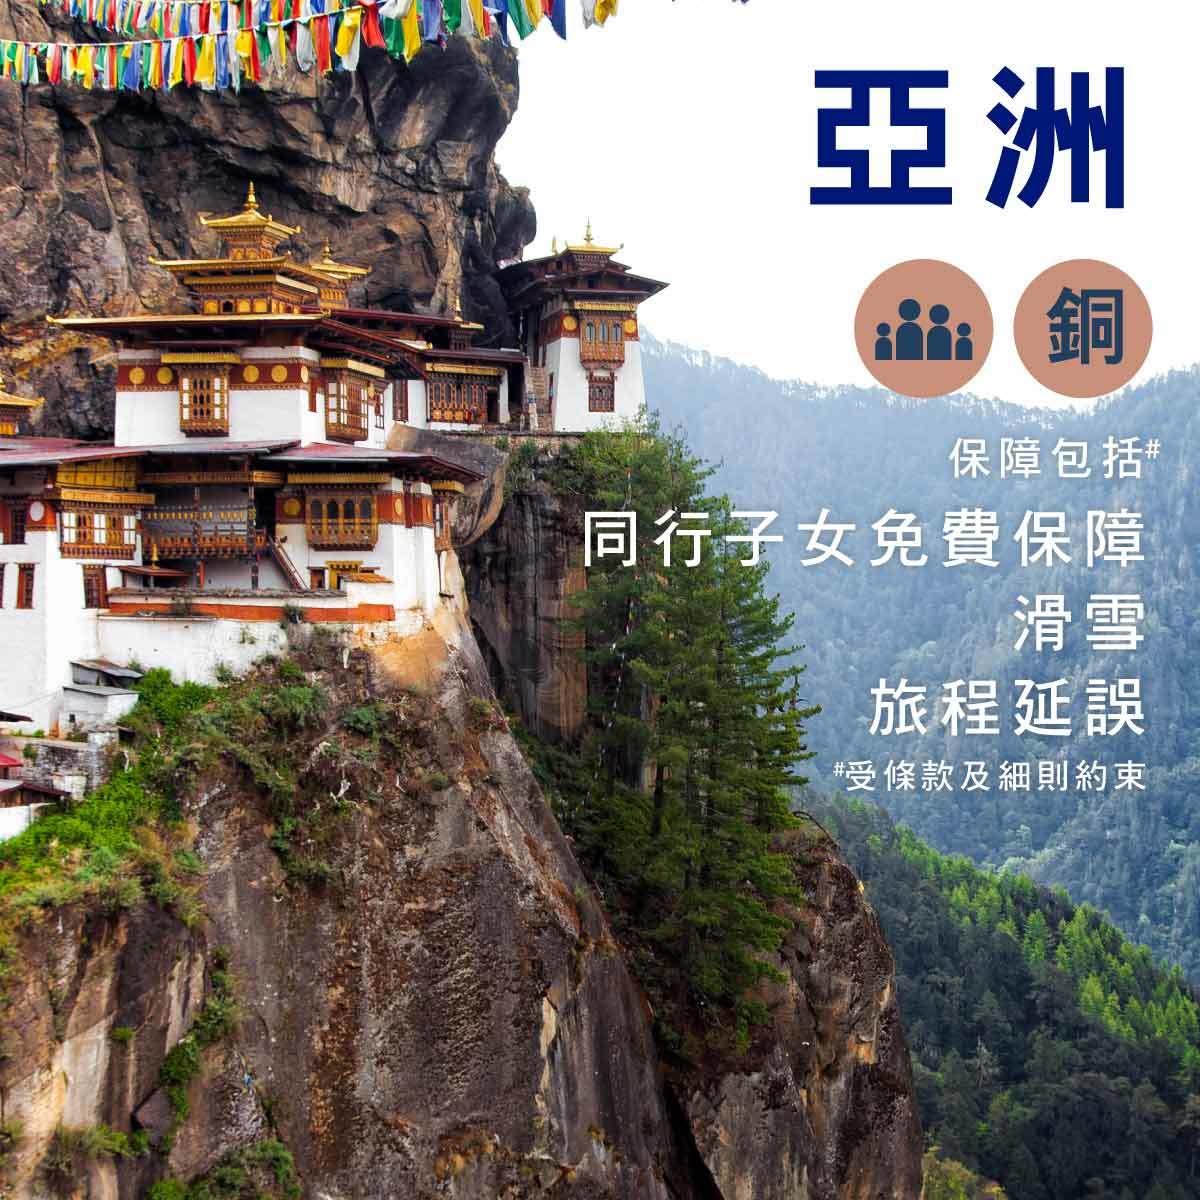 Asia - Single Trip Family Travel Insurance